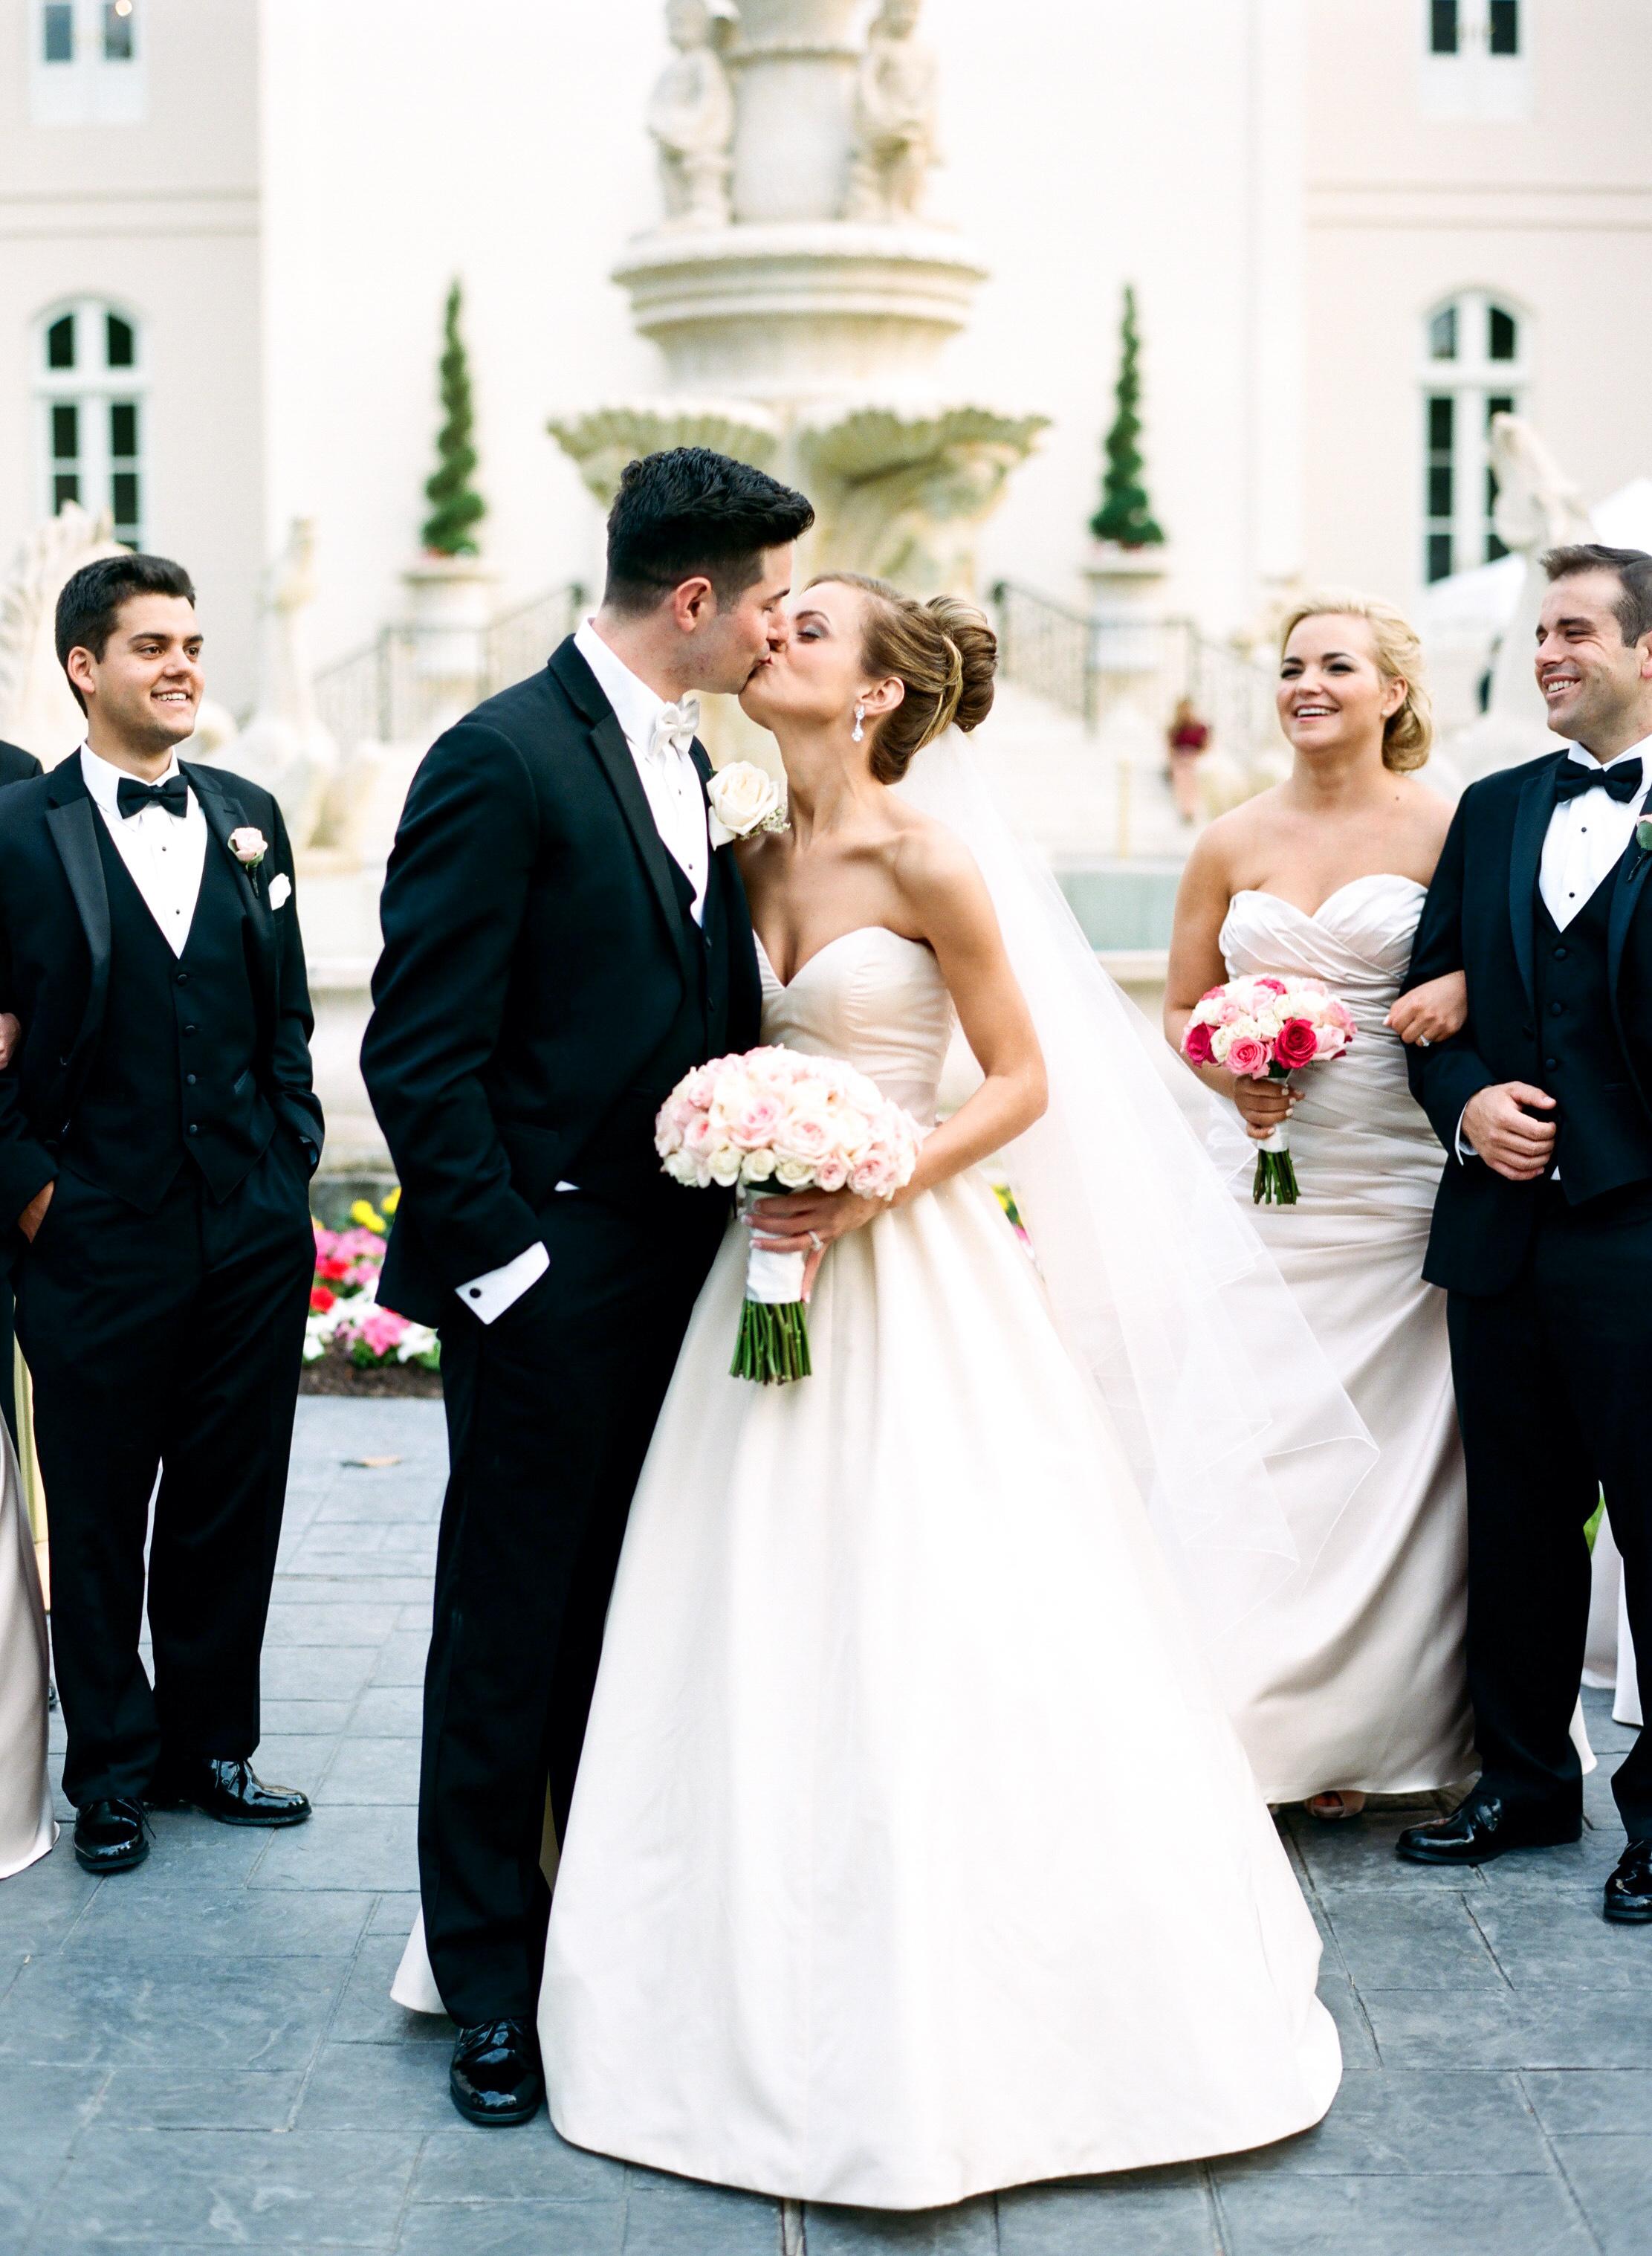 Dana-Fernandez-Photography-Houston-Wedding-Photographer-Style-Me-Pretty-Film-Texas-Destination-Photographer-34.jpg